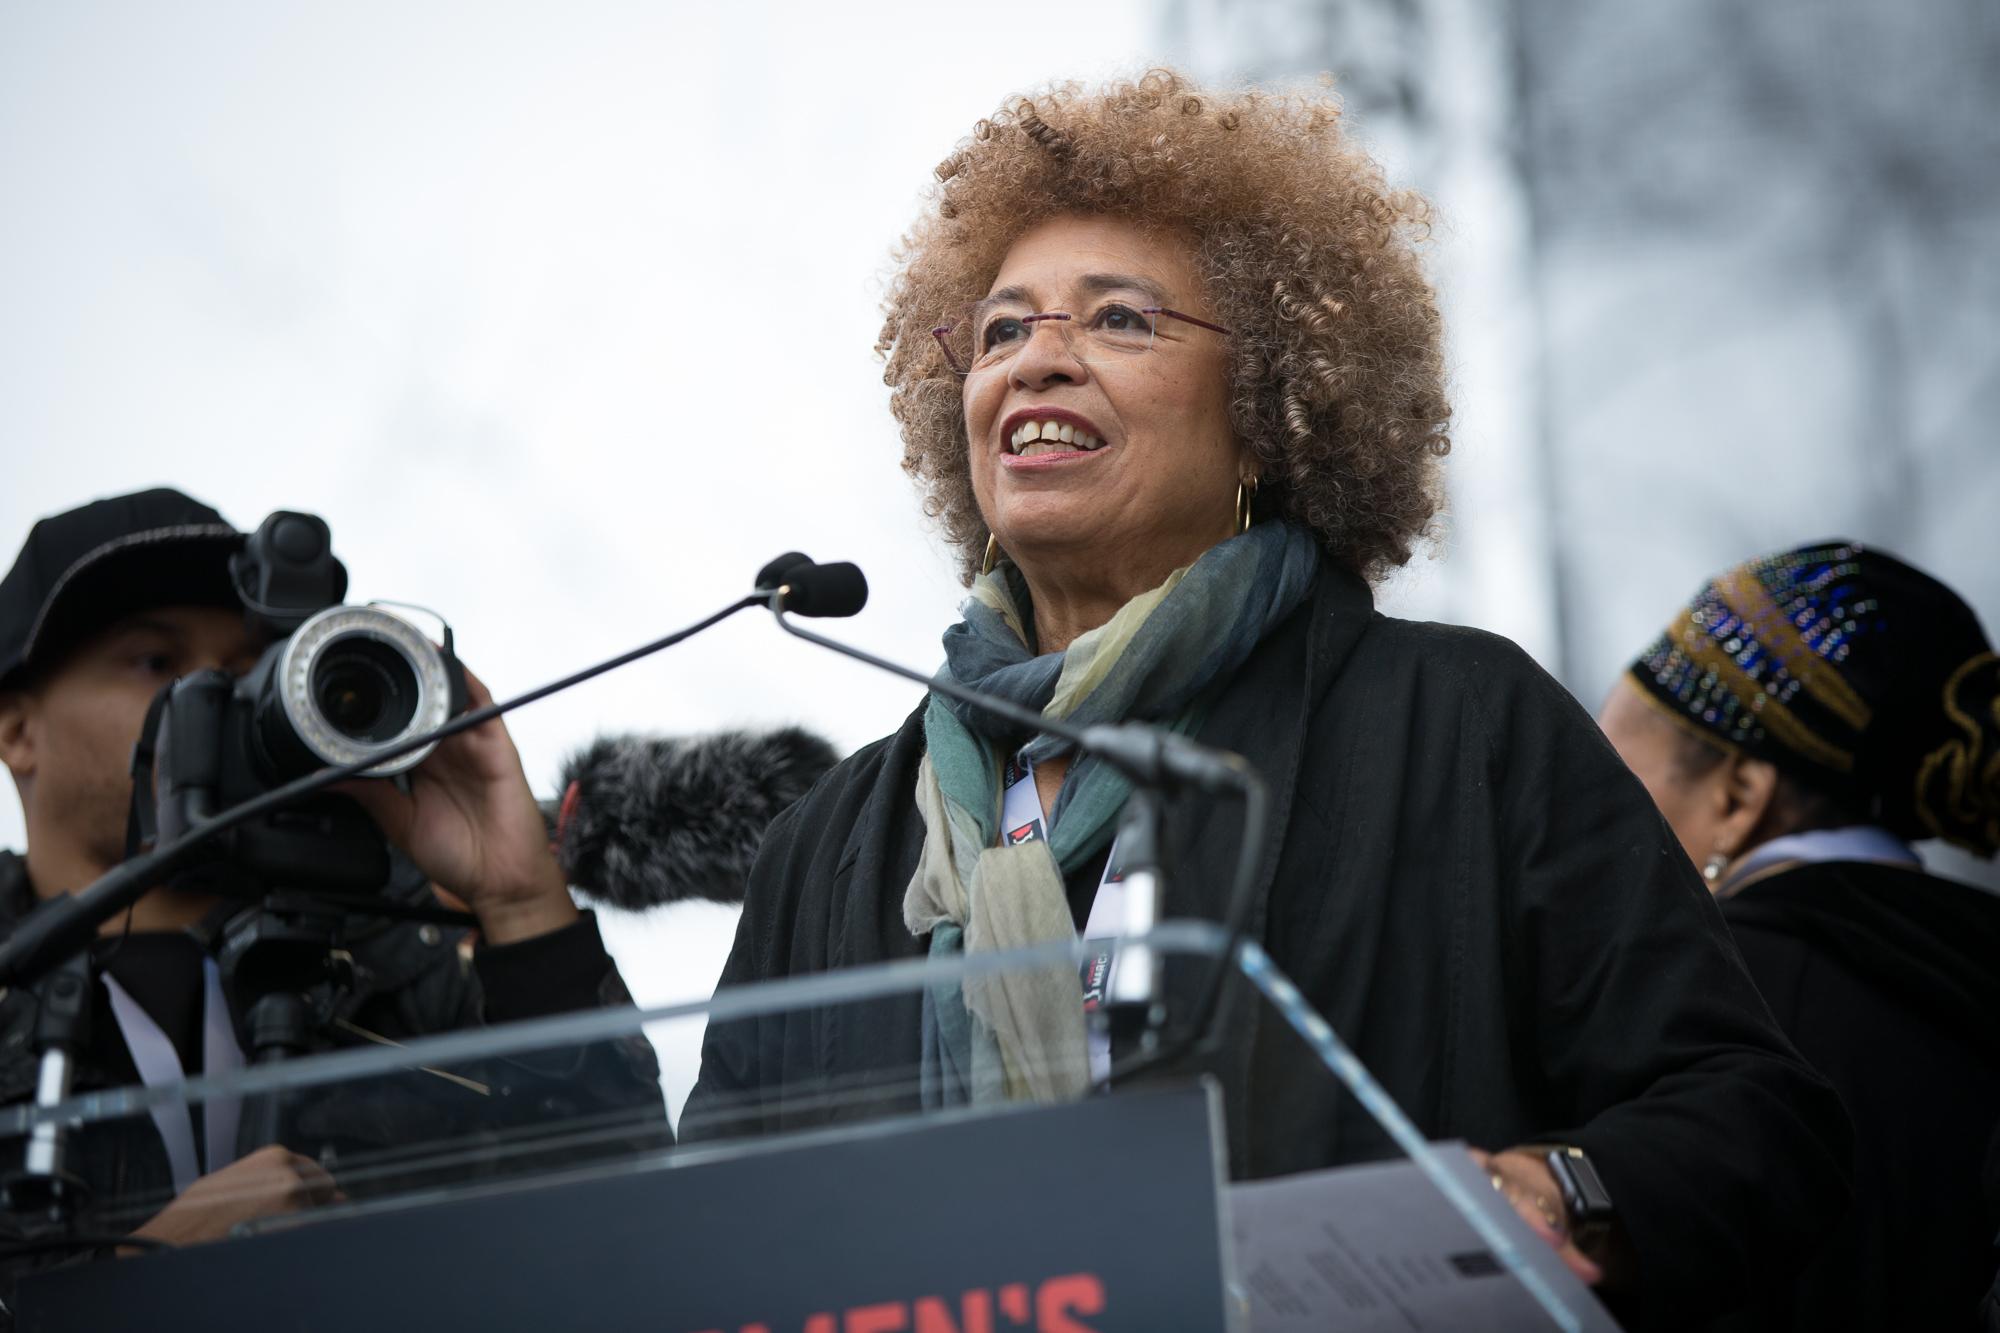 Angela Davis speaks at the Women's March on Washington, Jan. 21, 2017.Photo Credit: Alex Arbuckle